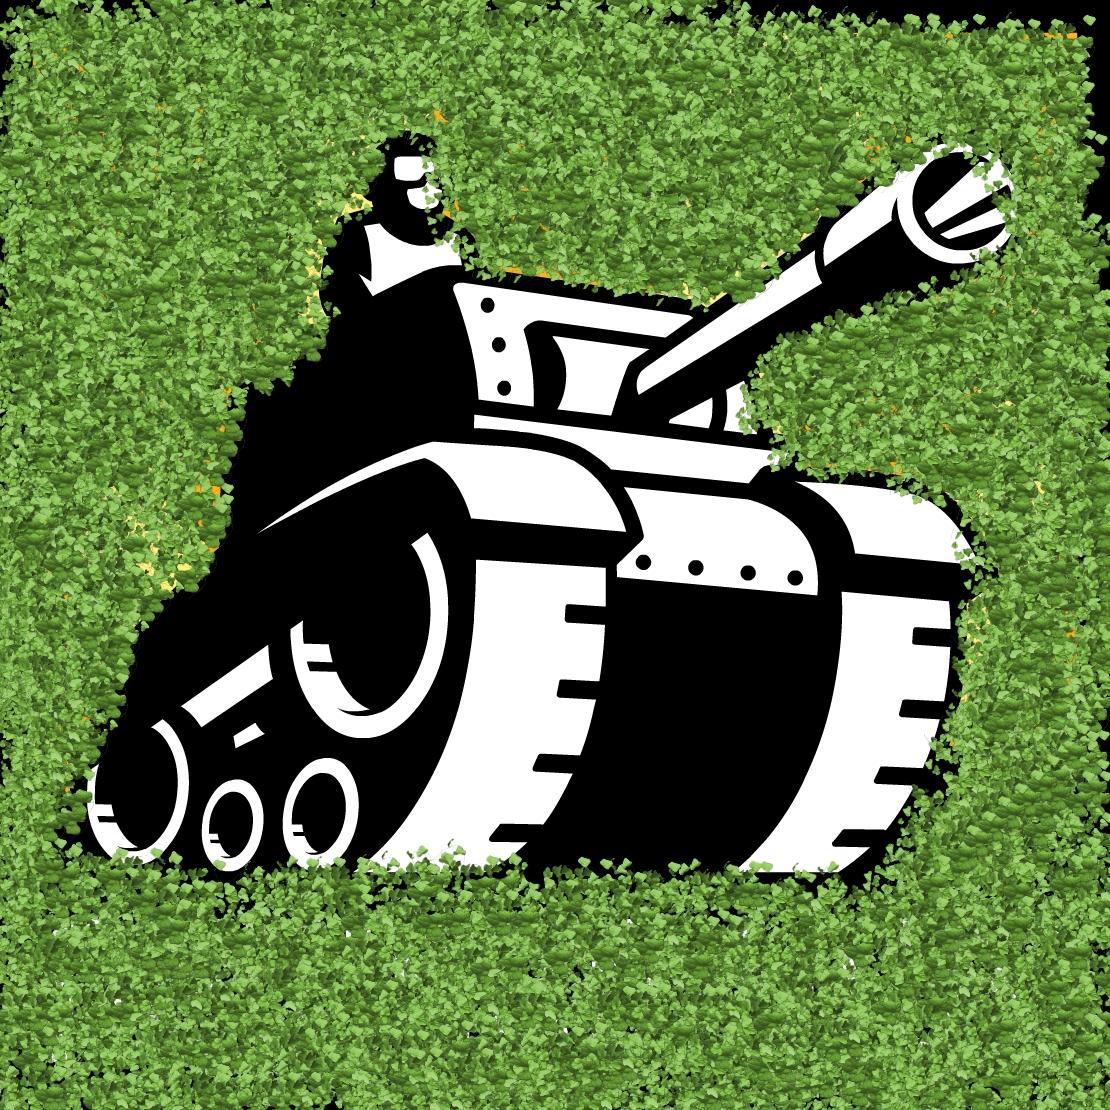 Tank in a garden